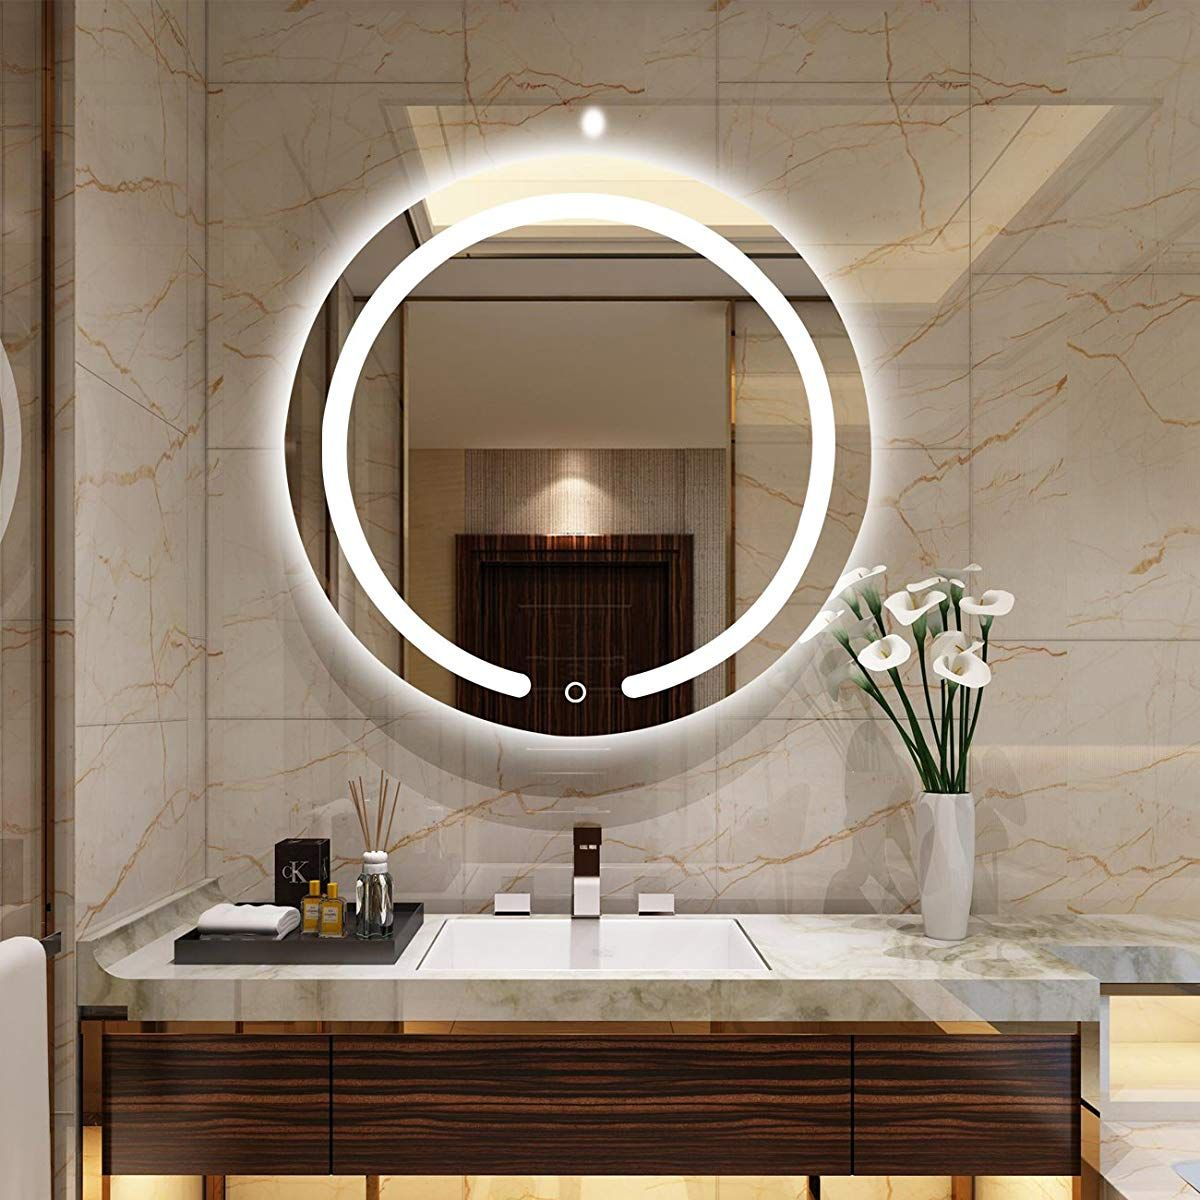 Aodailihb Led Bathroom Mirrors Wall 19 7x19 7 Round Waterproof